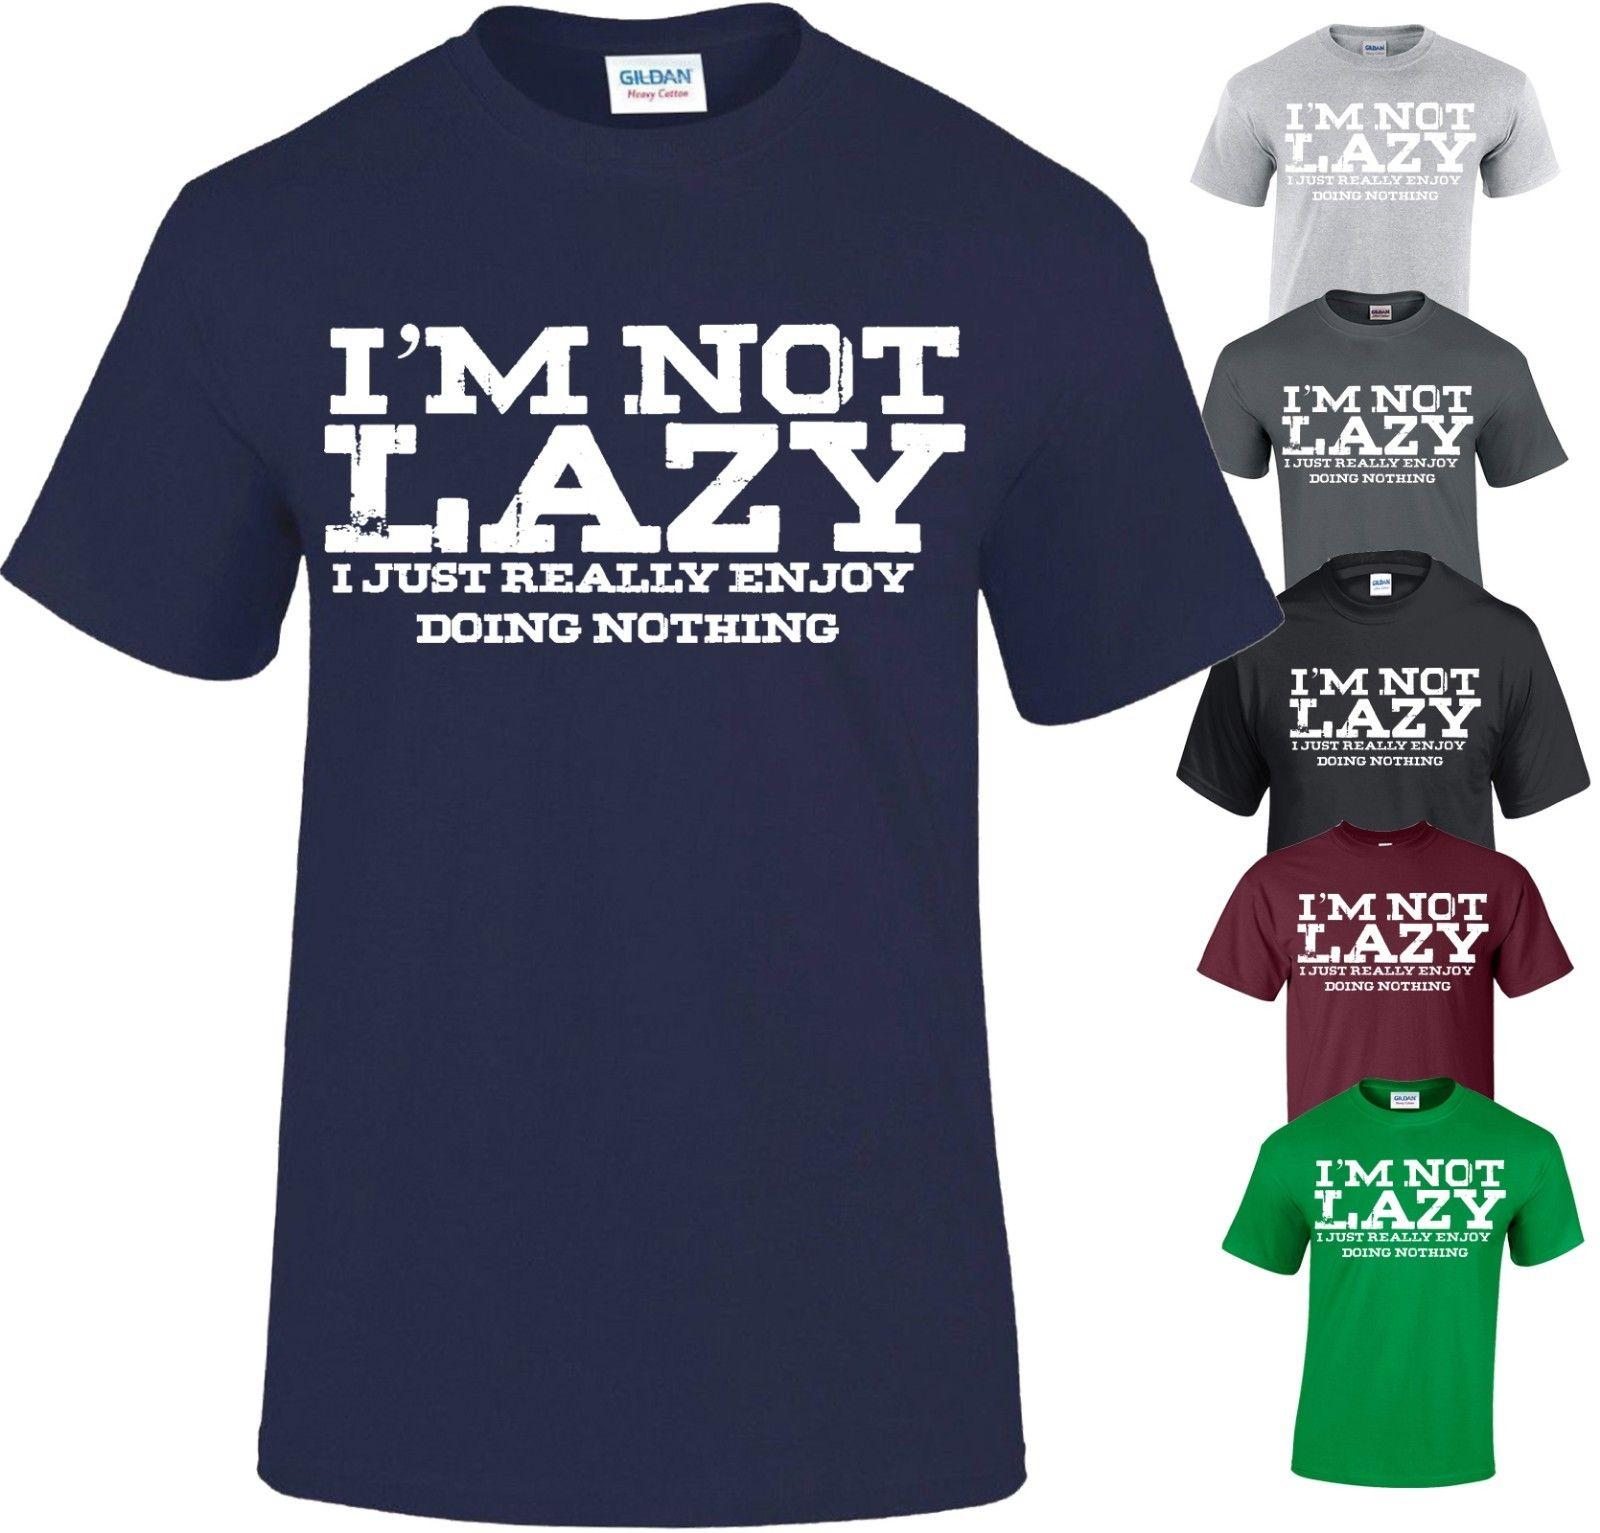 98b2b7e32 I M NOT LAZY PRINTED SLOGAN FUNNY MENS T SHIRTS NOVELTY JOKE GIFT XMAS TOP  TEE O Neck Fashion Printed Mens Cotton T Shirt Really Funny Shirts Clothes T  ...